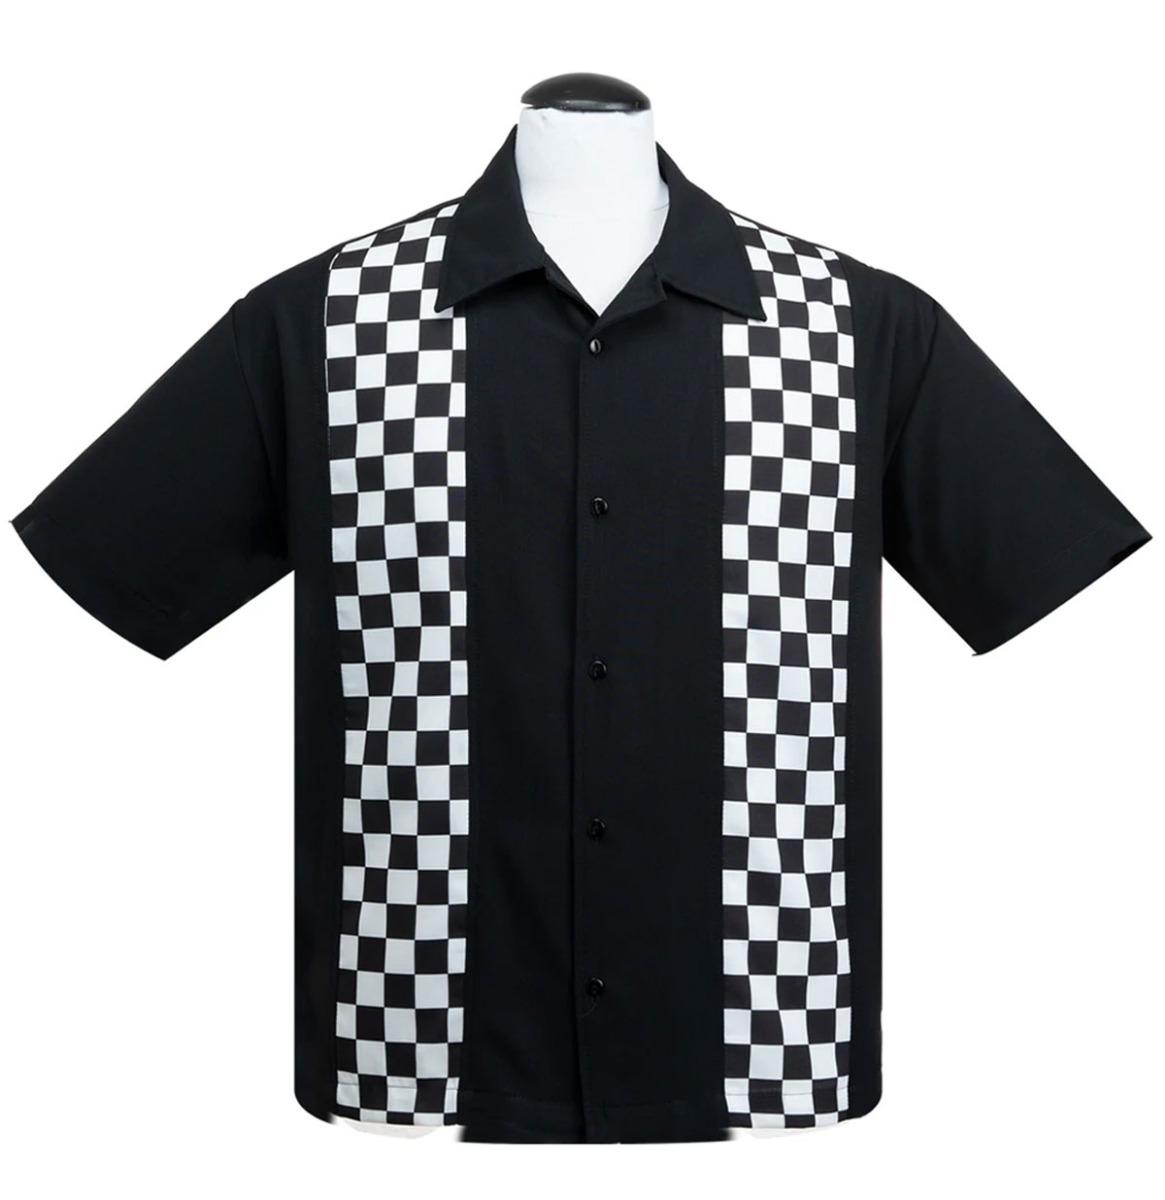 Steady Clothing Checkered Mini Panel Shirt Zwart / Wit